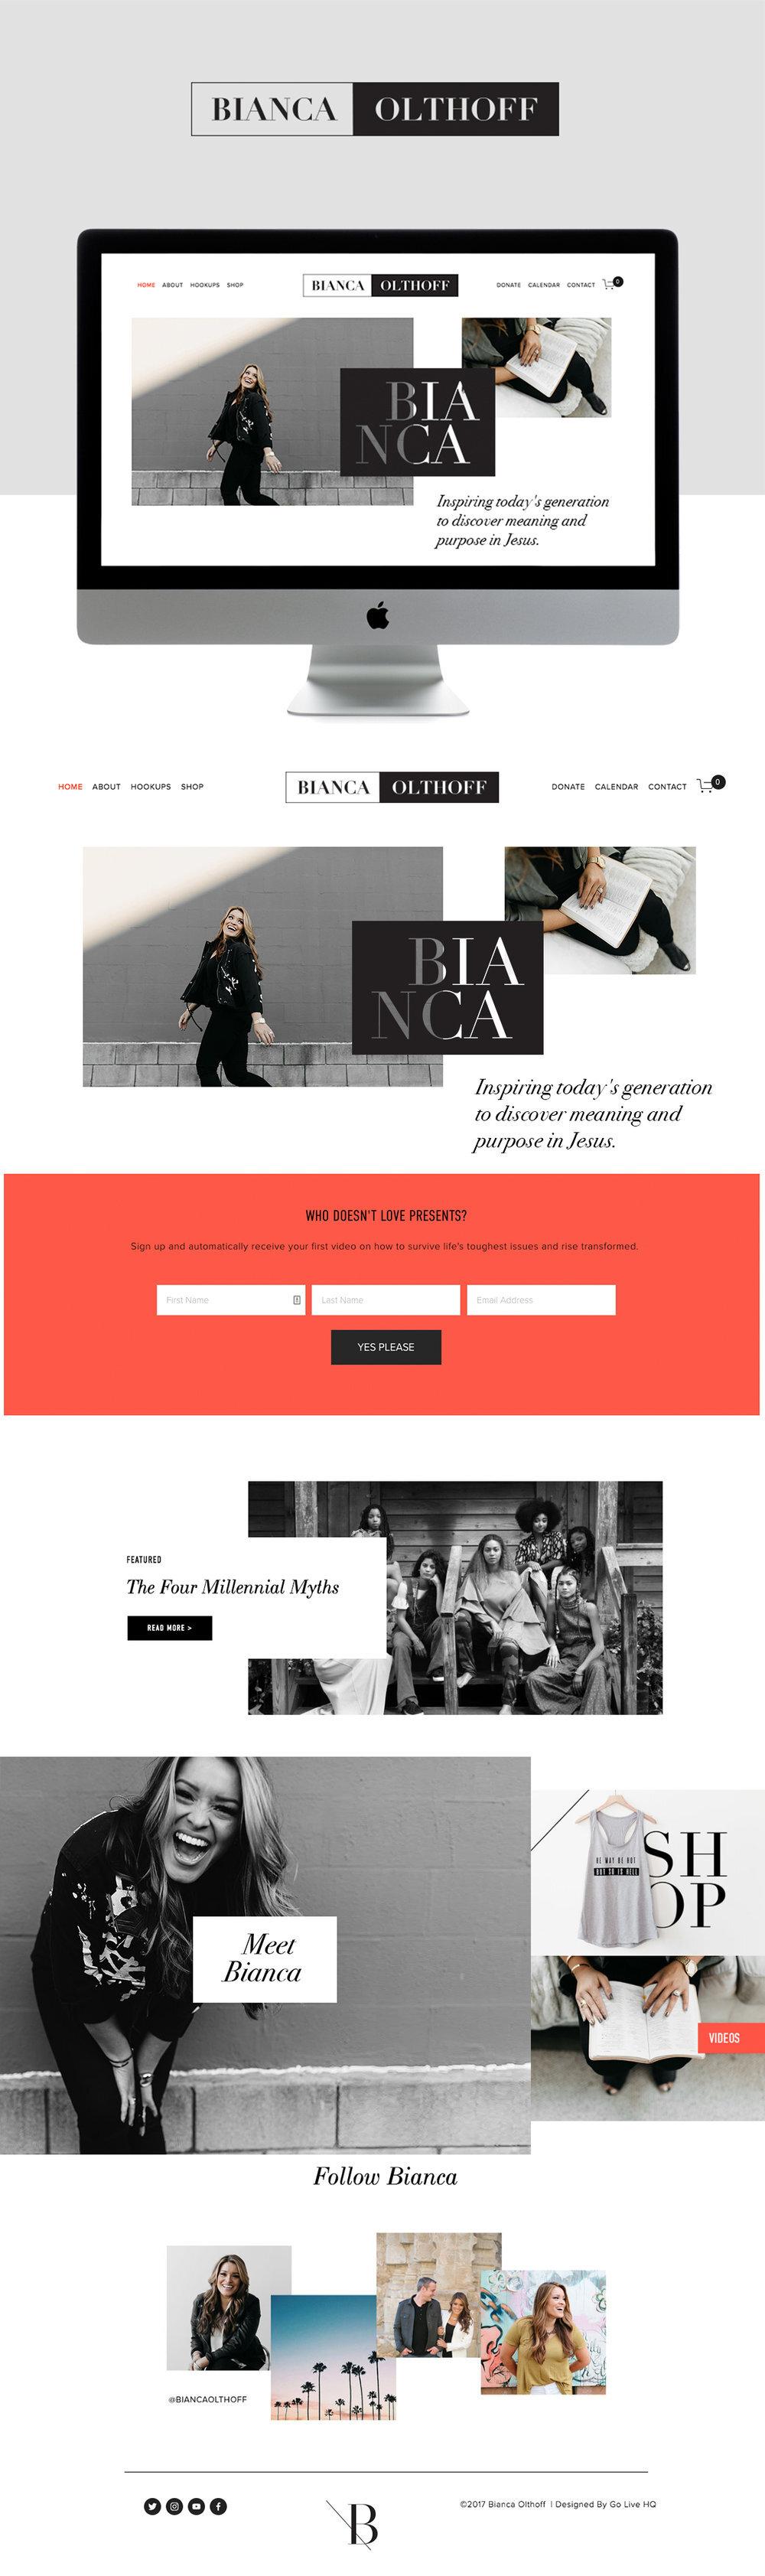 editorial+and+bold+squarespace+website+design+_+designed+by_+golivehq.jpg